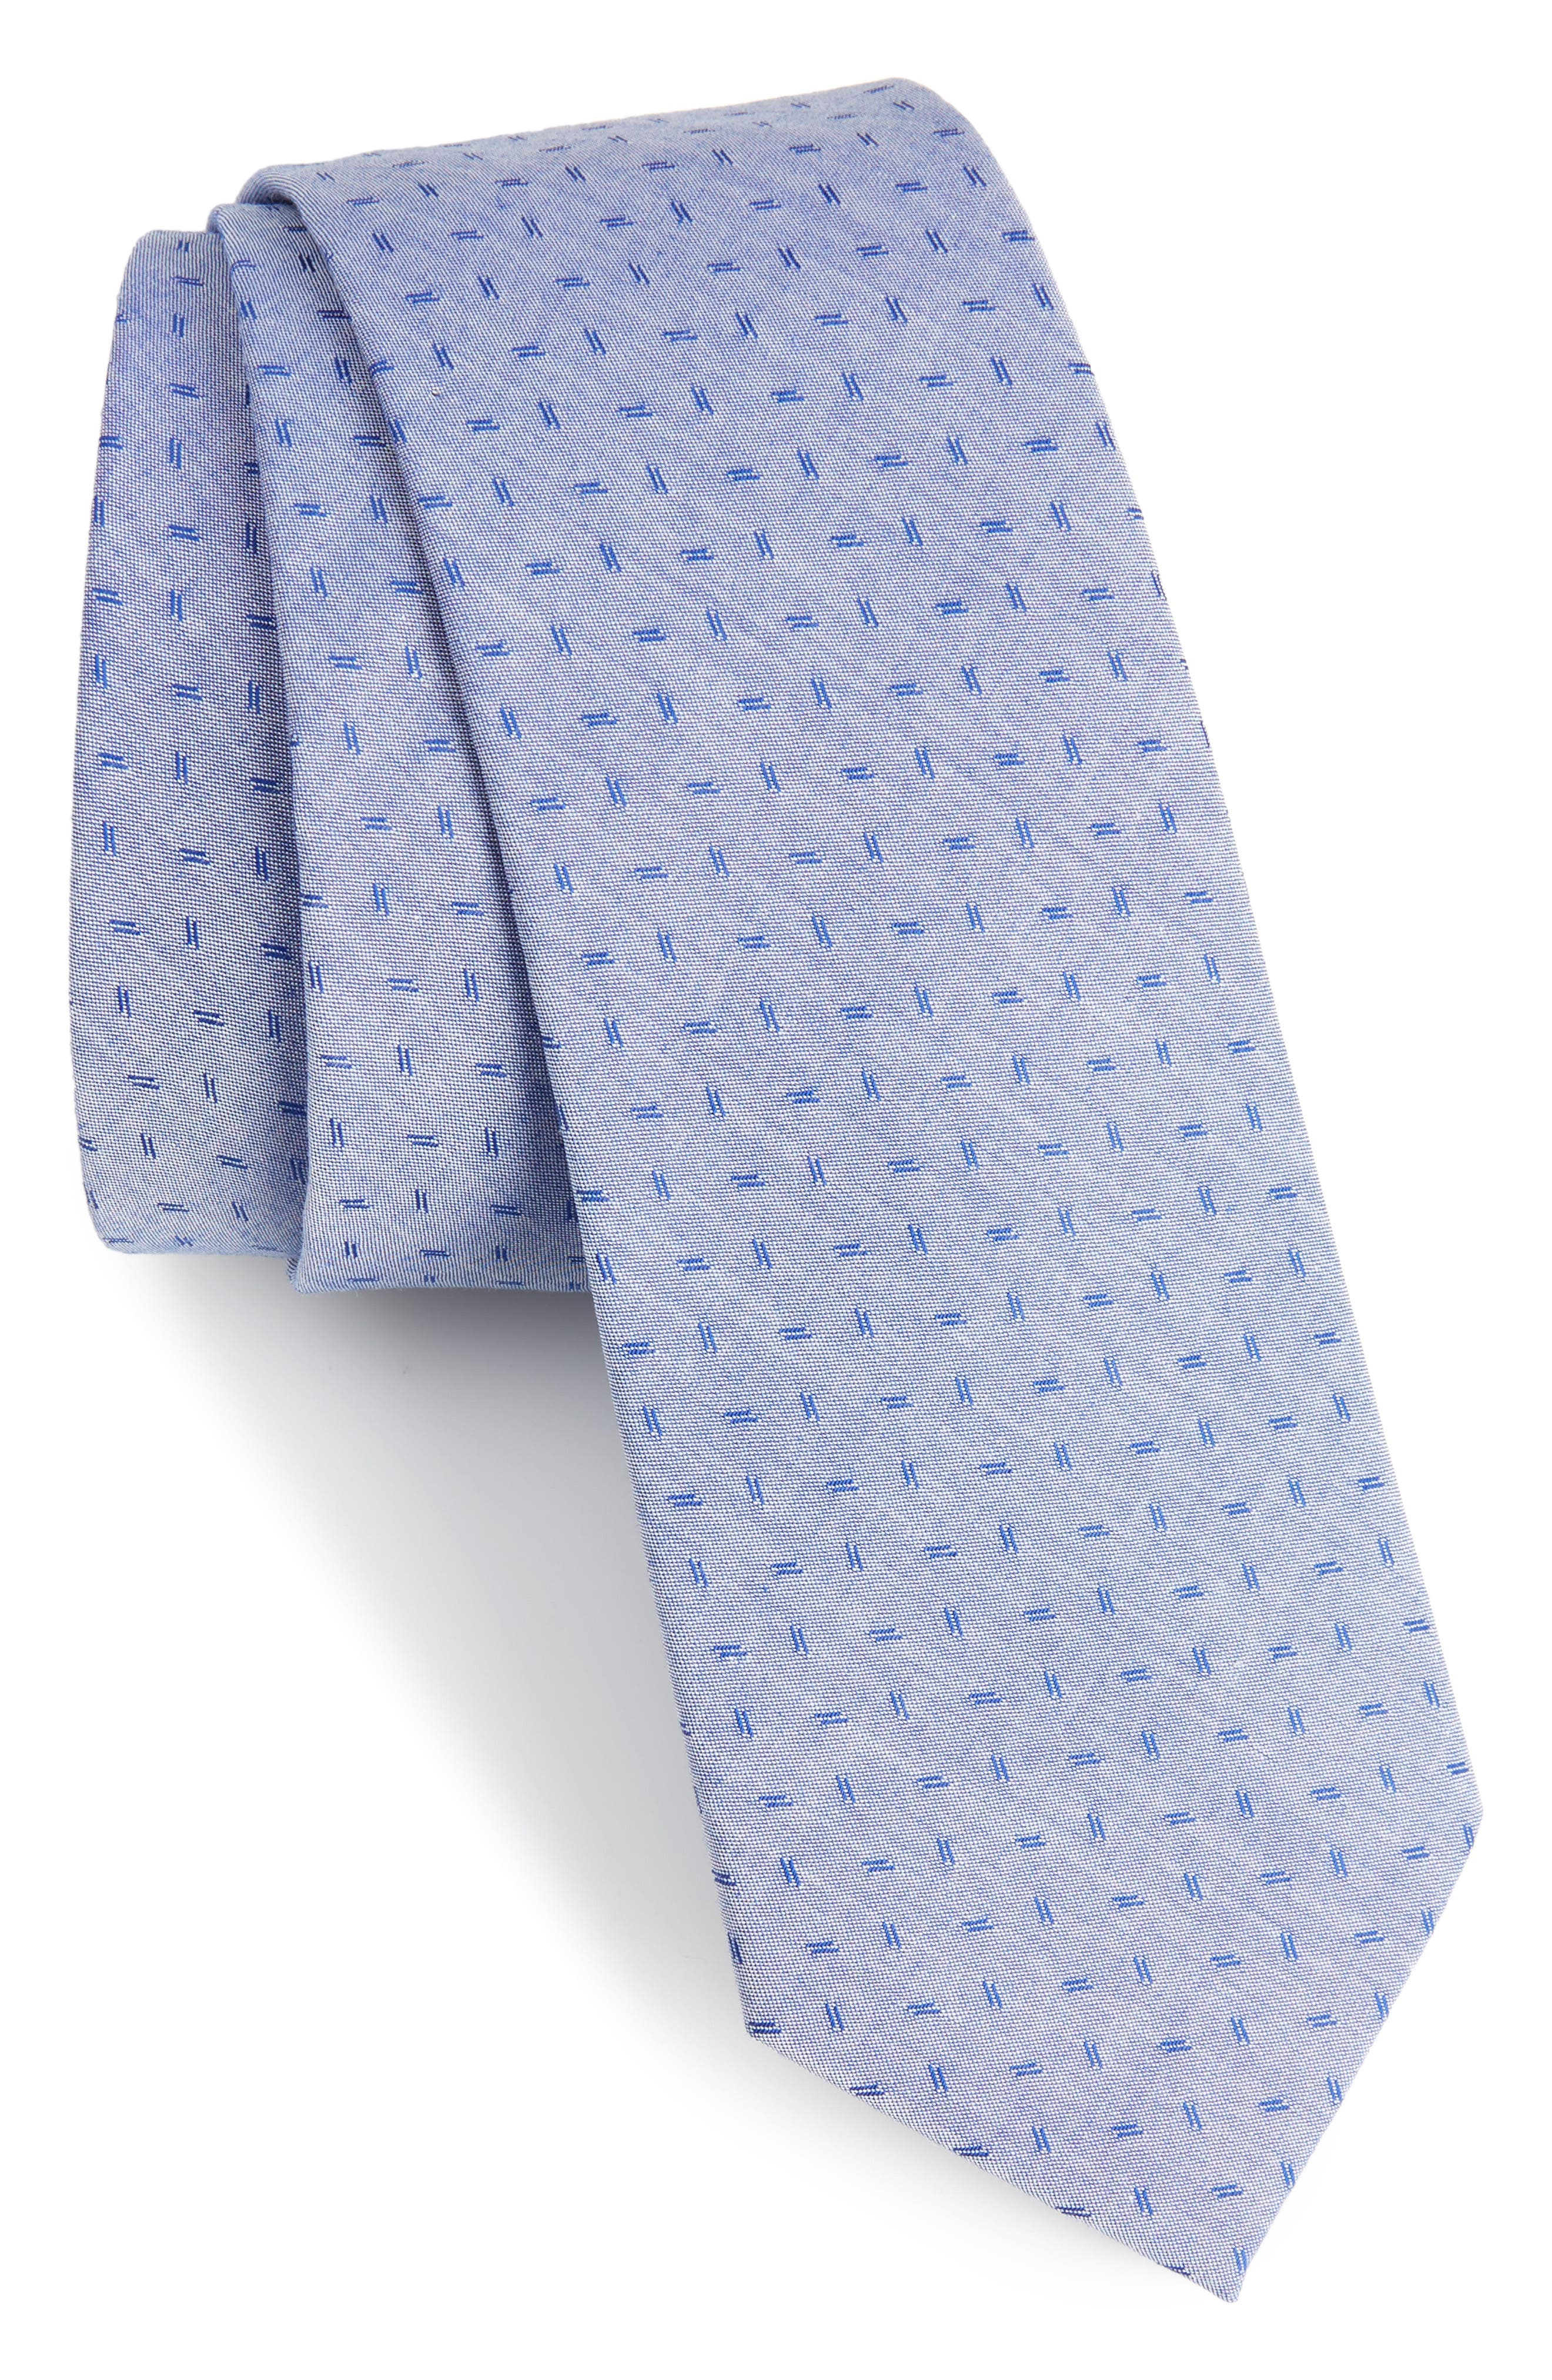 Indigo Microgrid Cotton Skinny Tie,                         Main,                         color, Blue